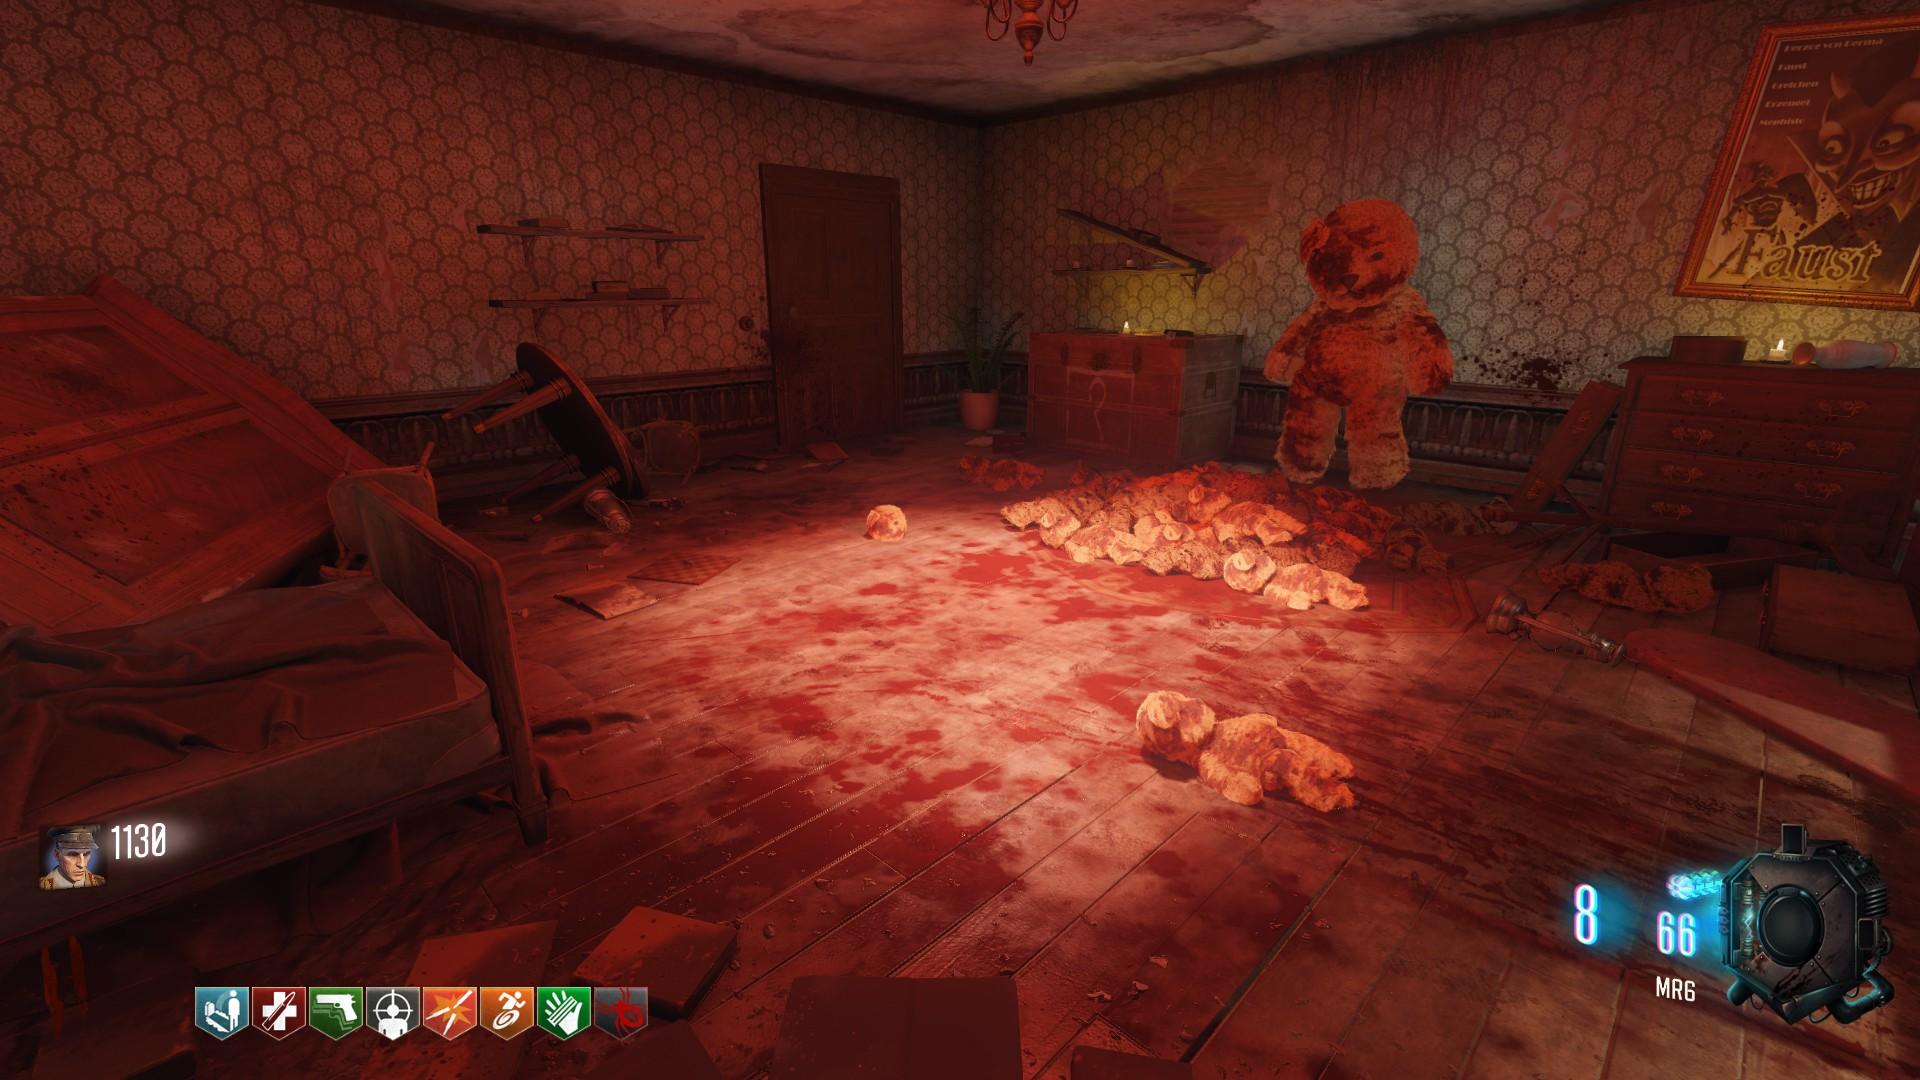 Steam Community :: Guide :: Guide for Kino Der Toten